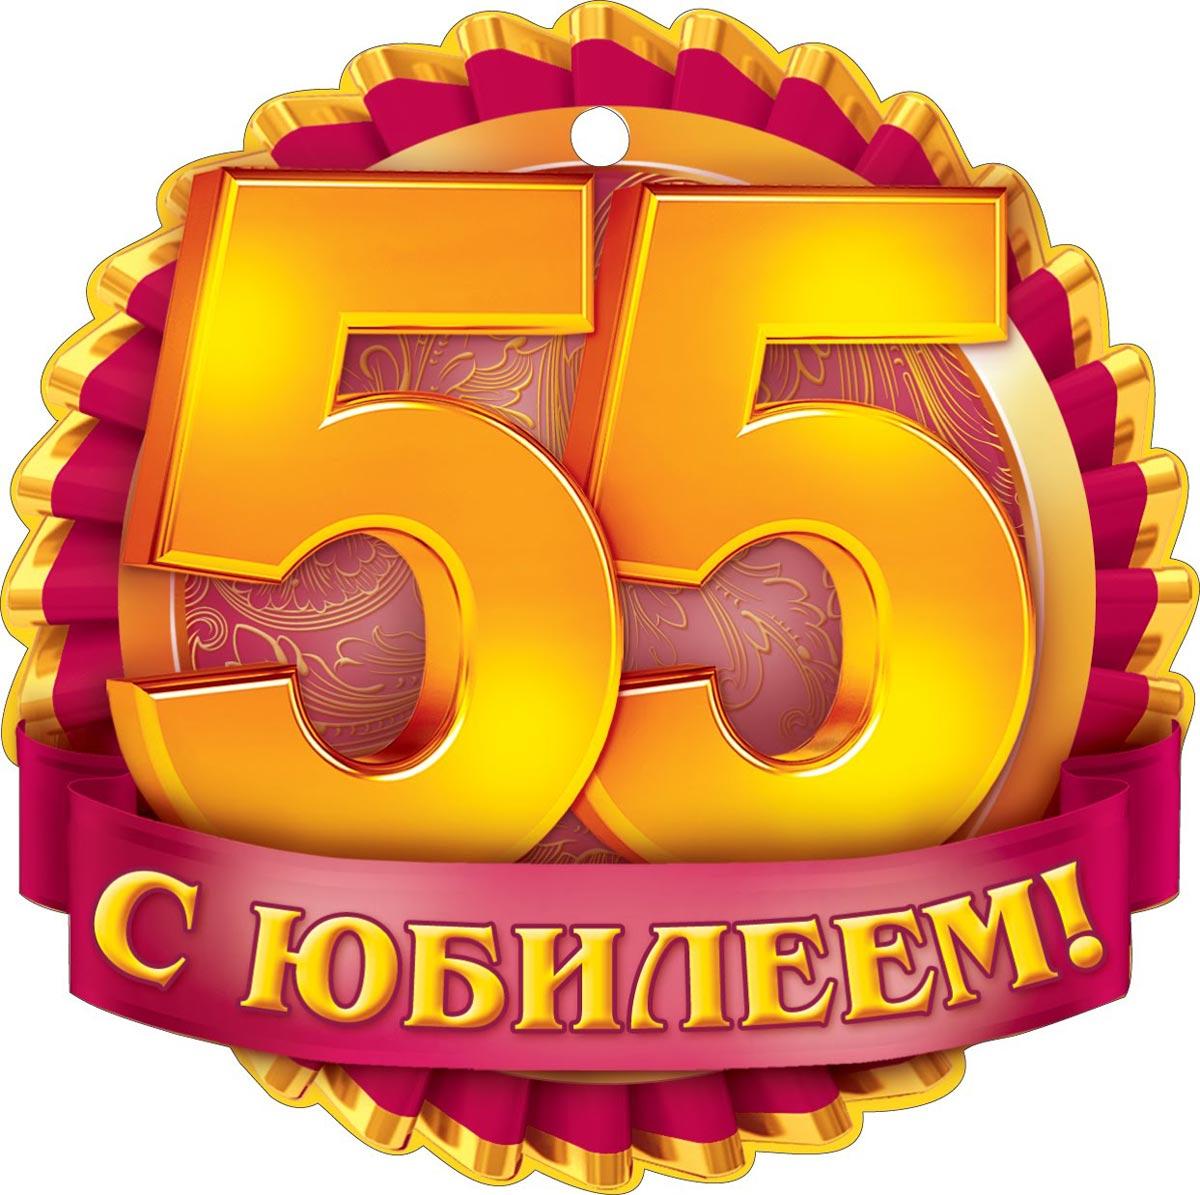 55 лет - важная дата! Фото с сайта ytimg.com